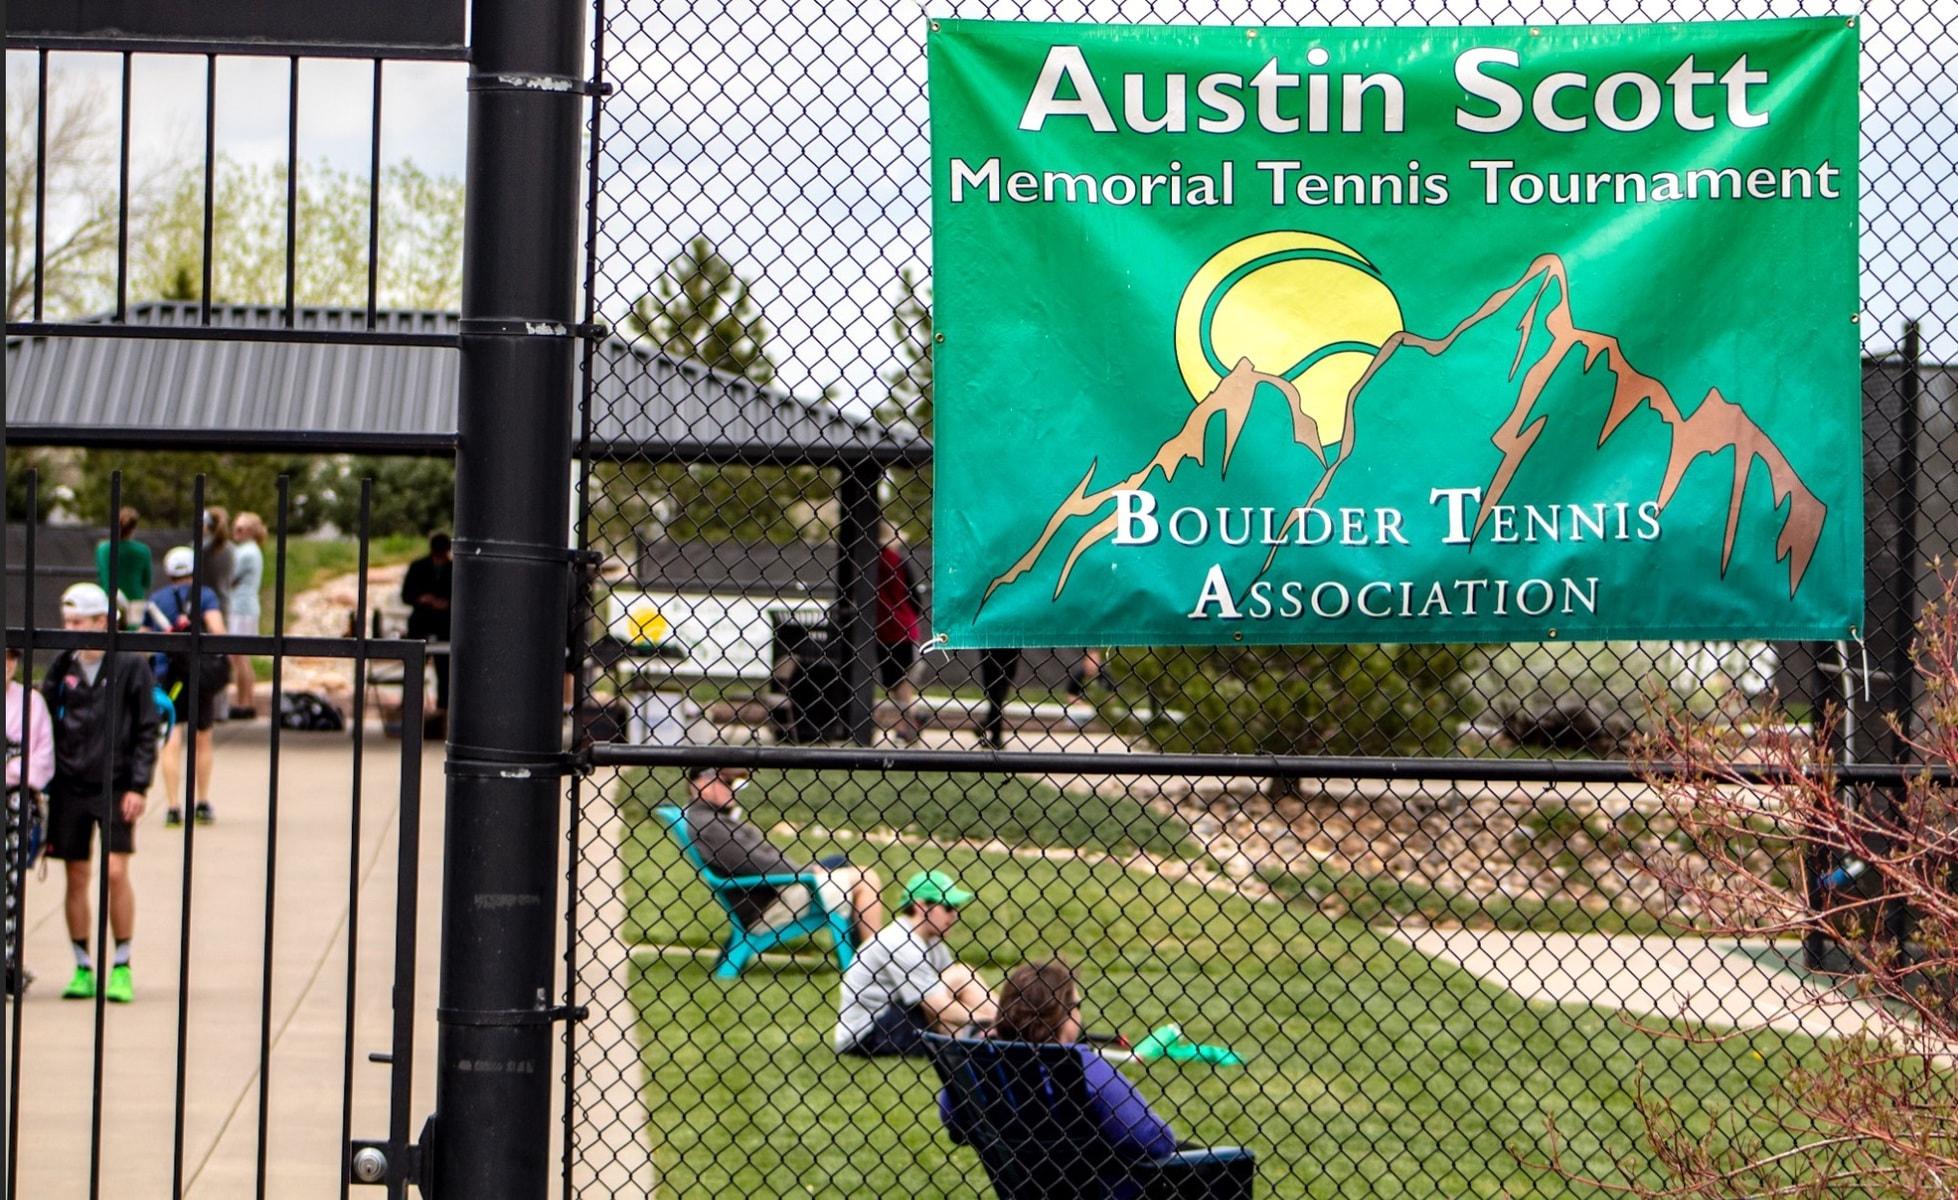 Austin Scott banner on fence at tournament